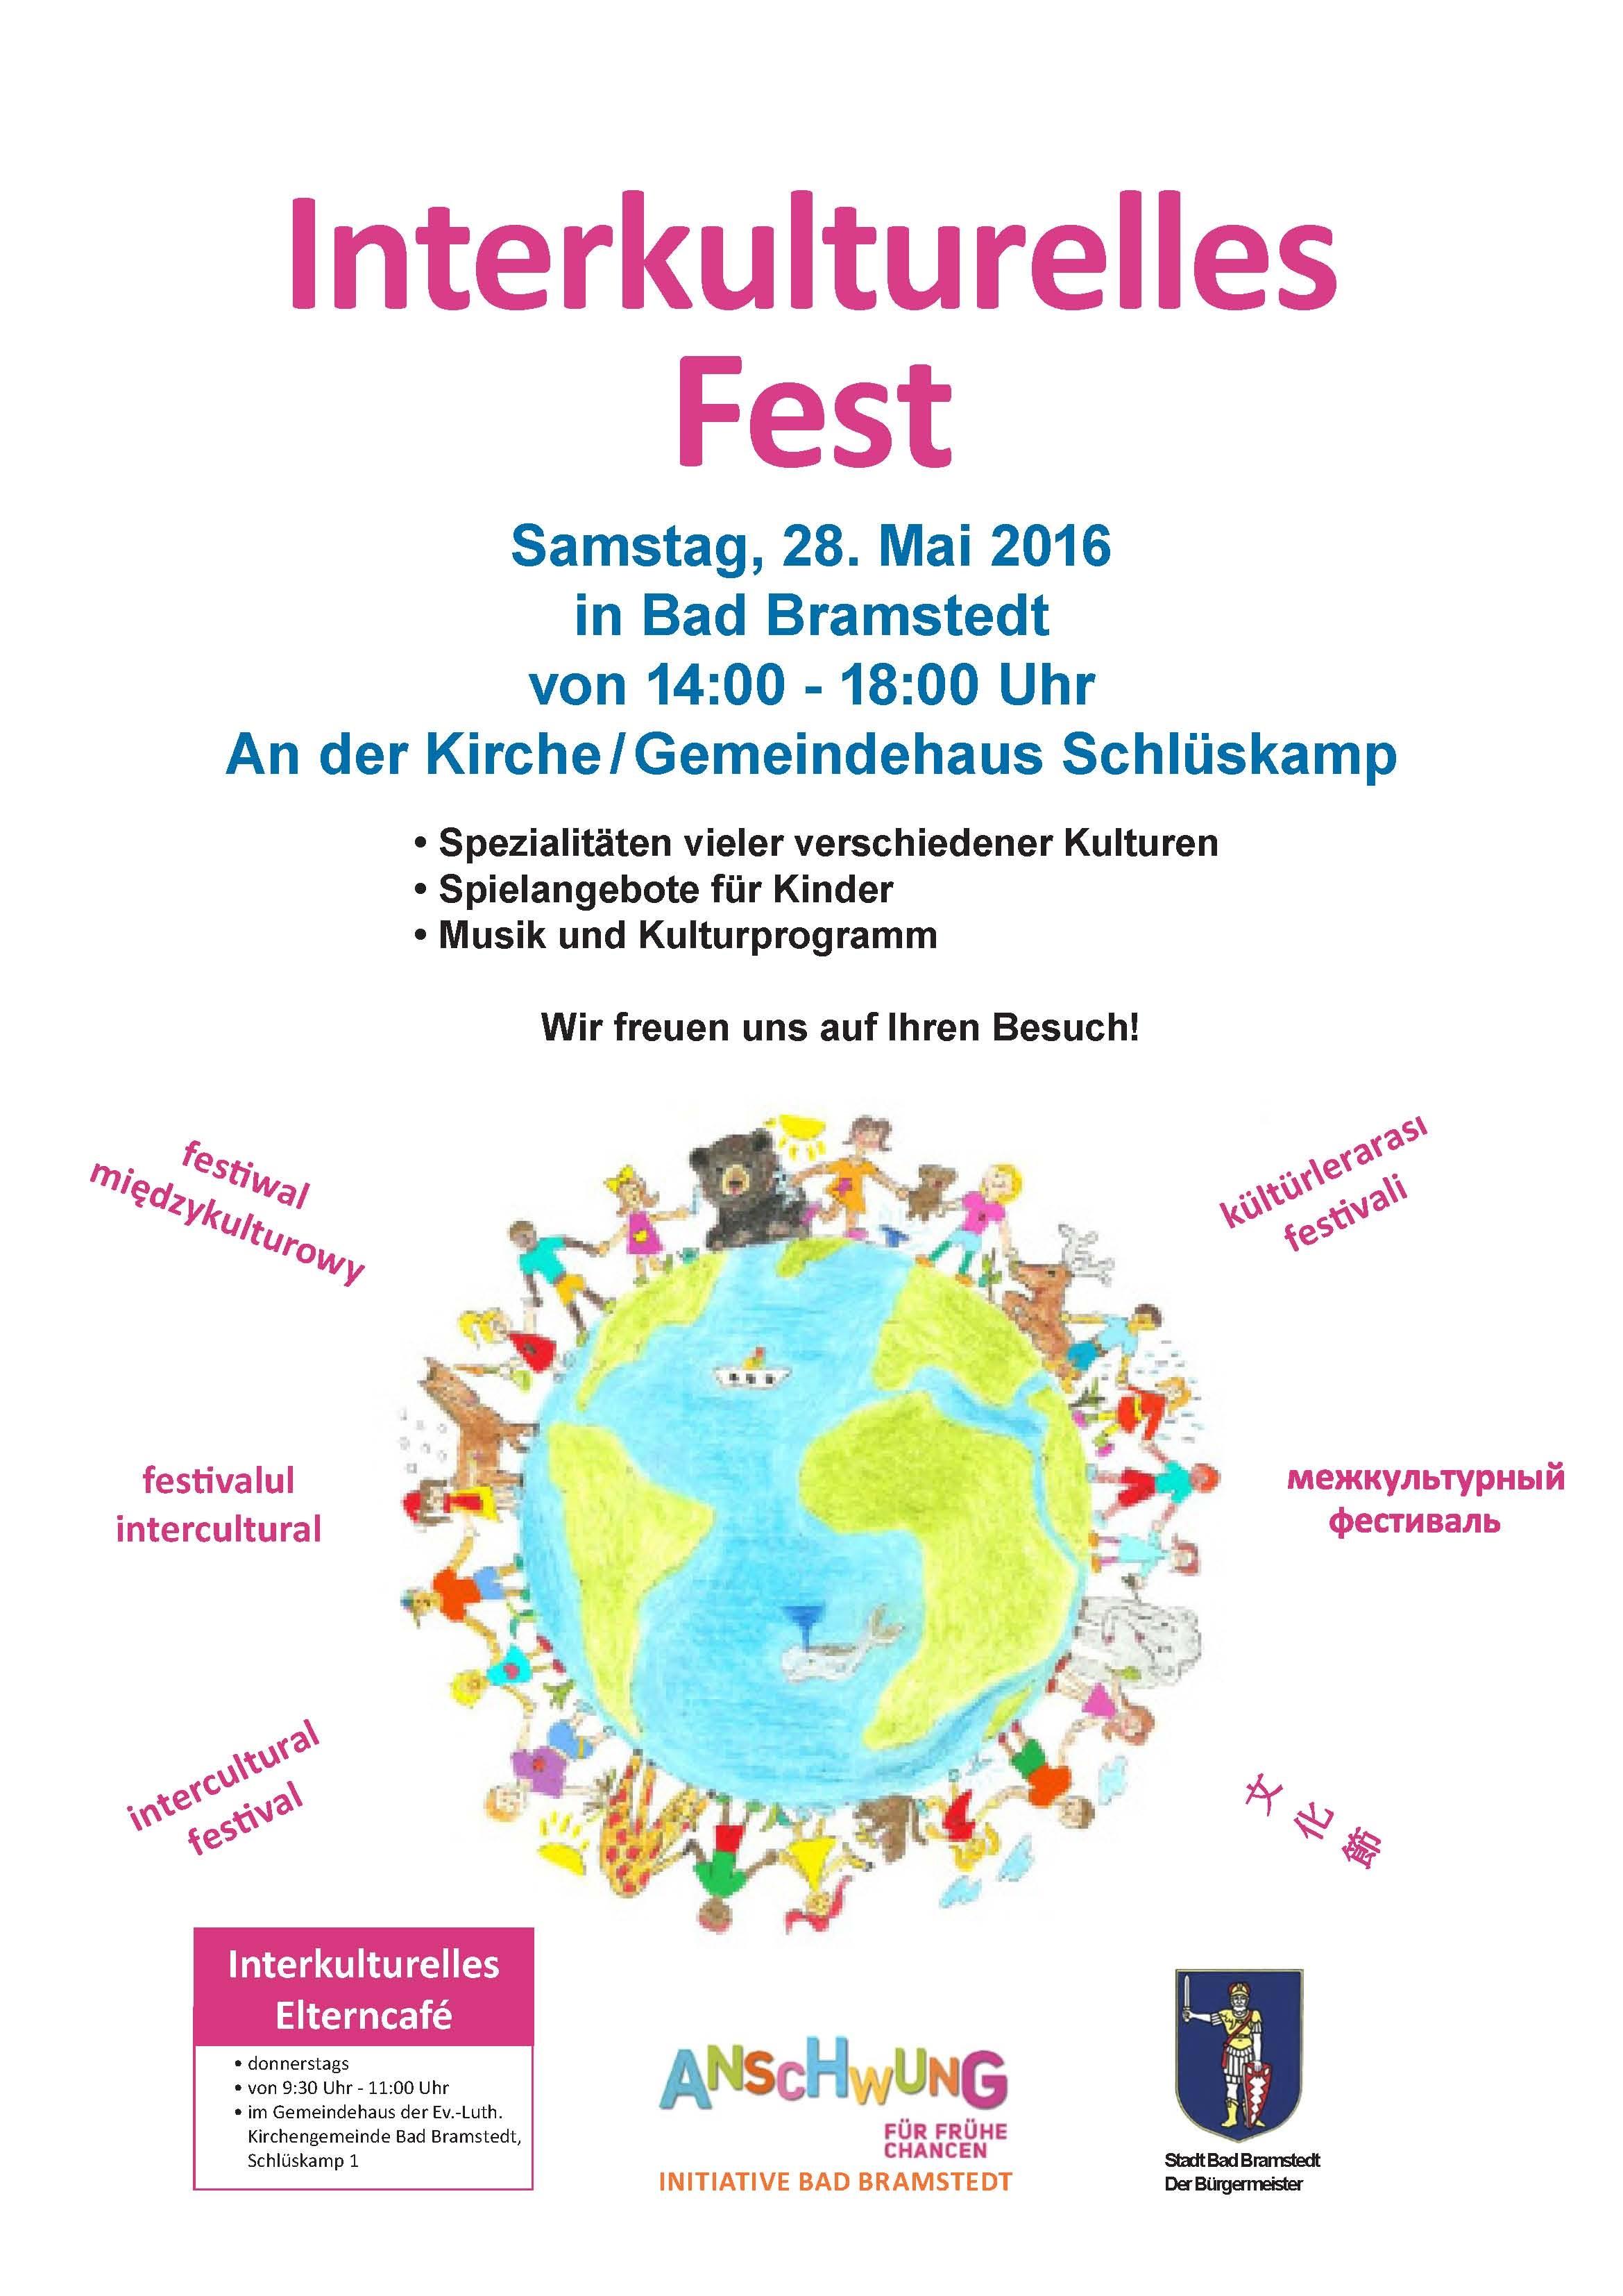 plakat-interkulturelles-fest 2016